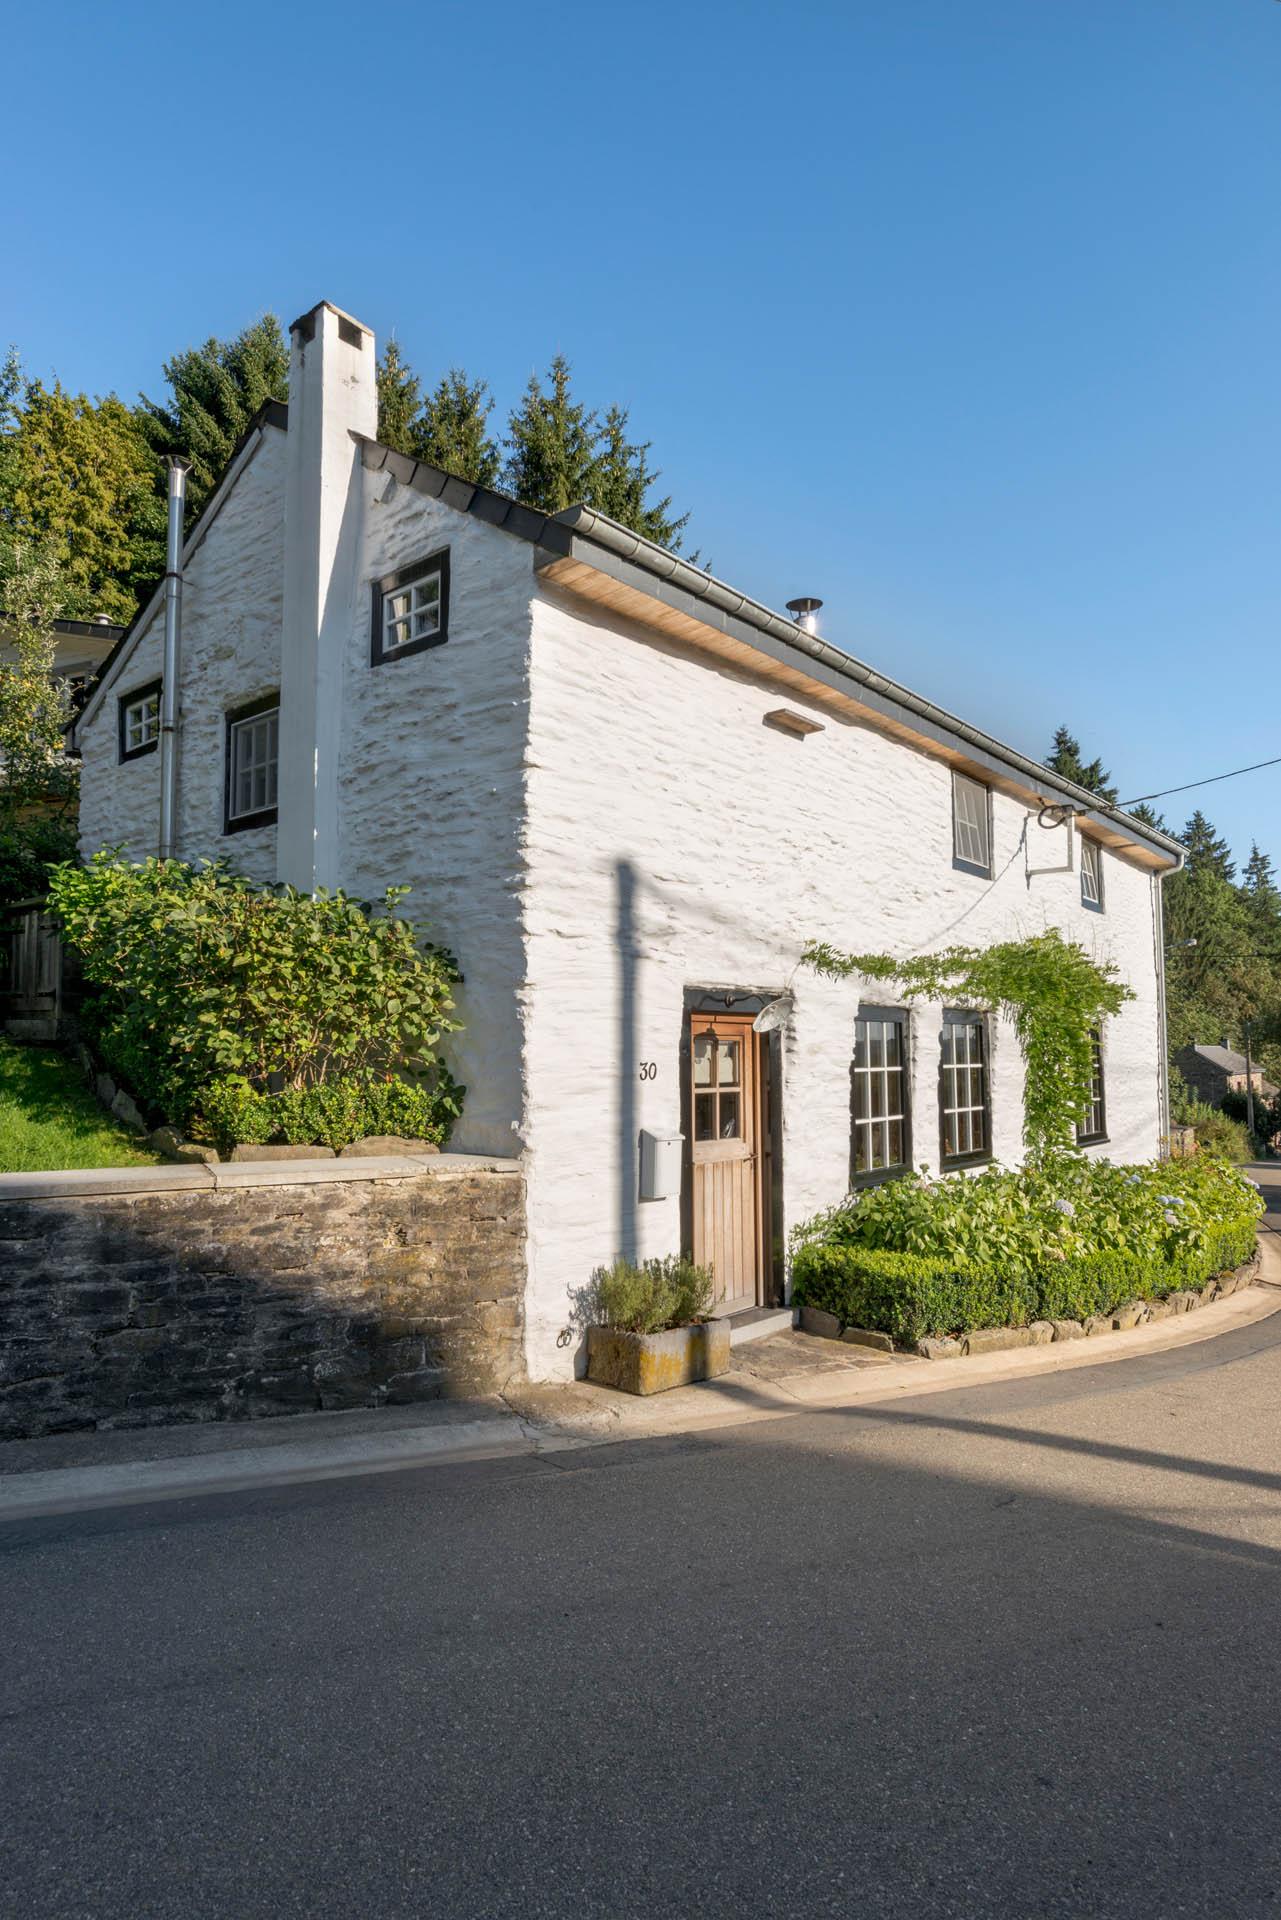 Welkom - Le cottage d'Ollomont